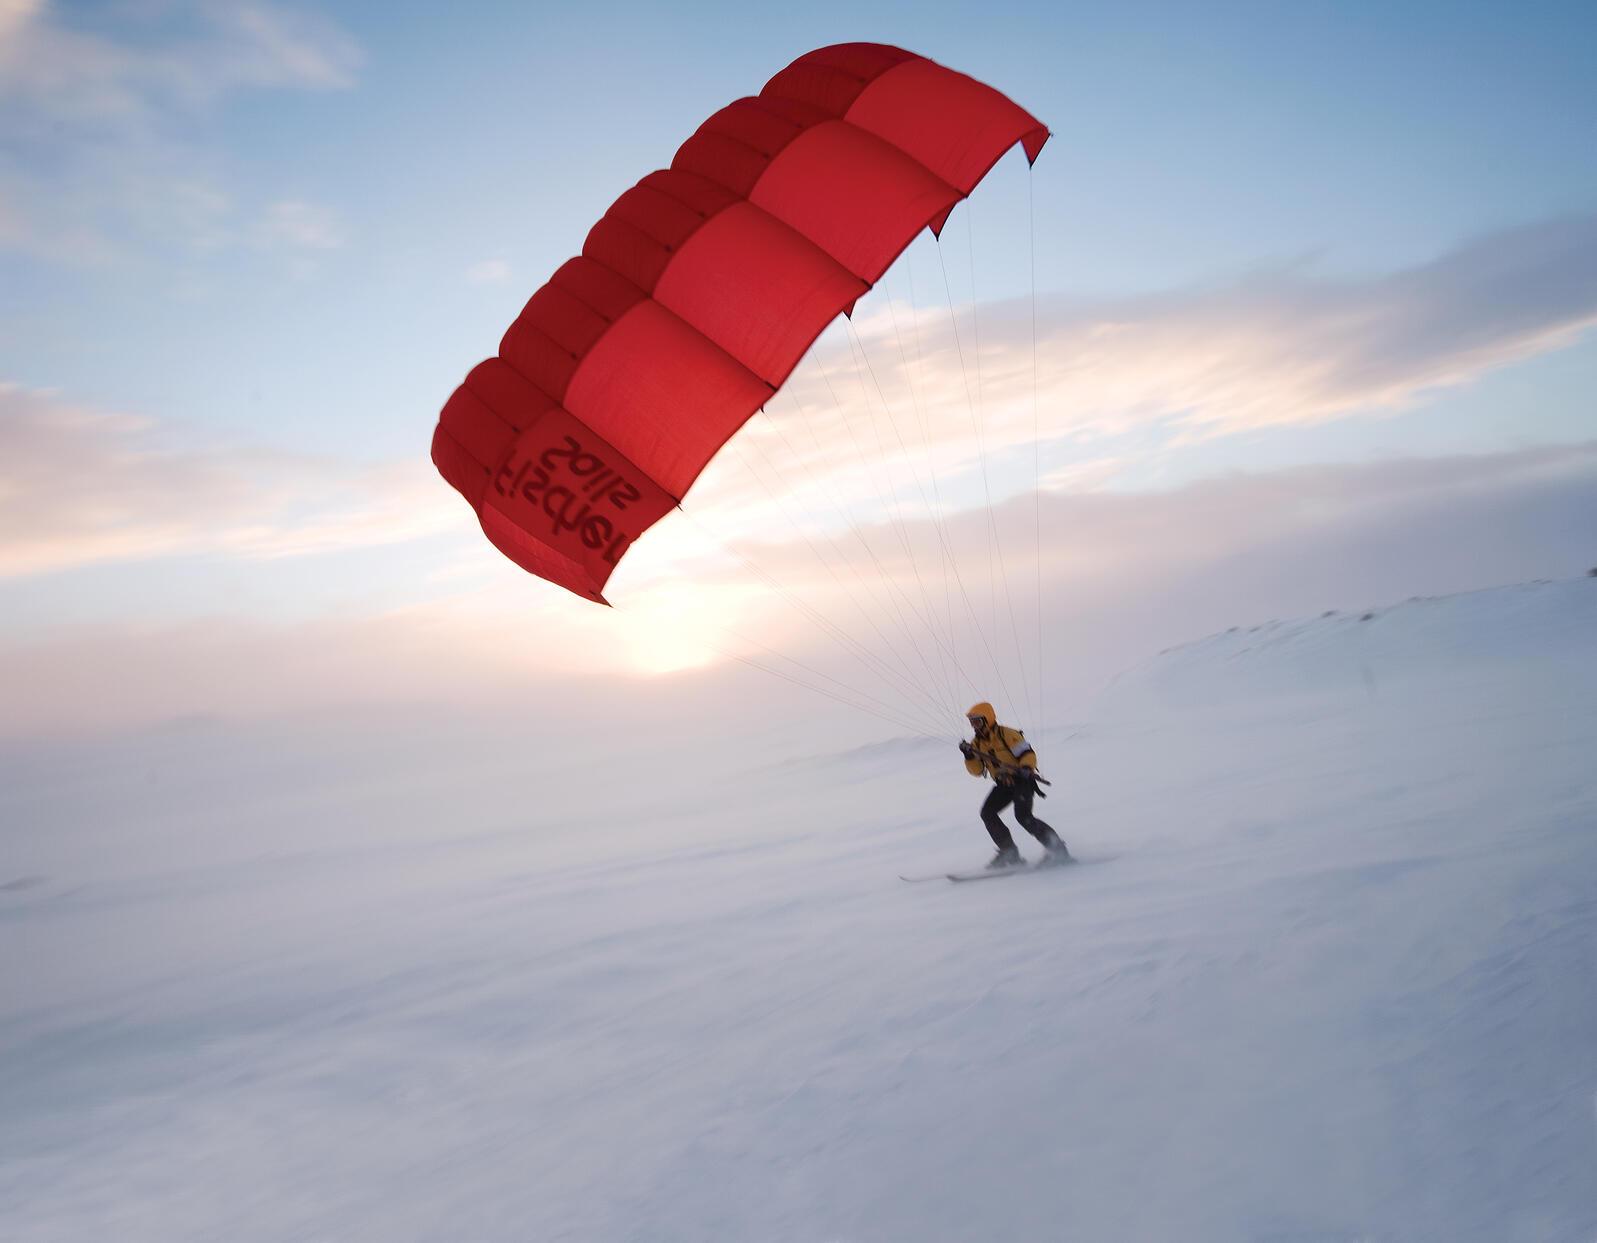 Hardangervidda National Park's constant winds make it a popular destination for ski sailors. Per Breiehagen